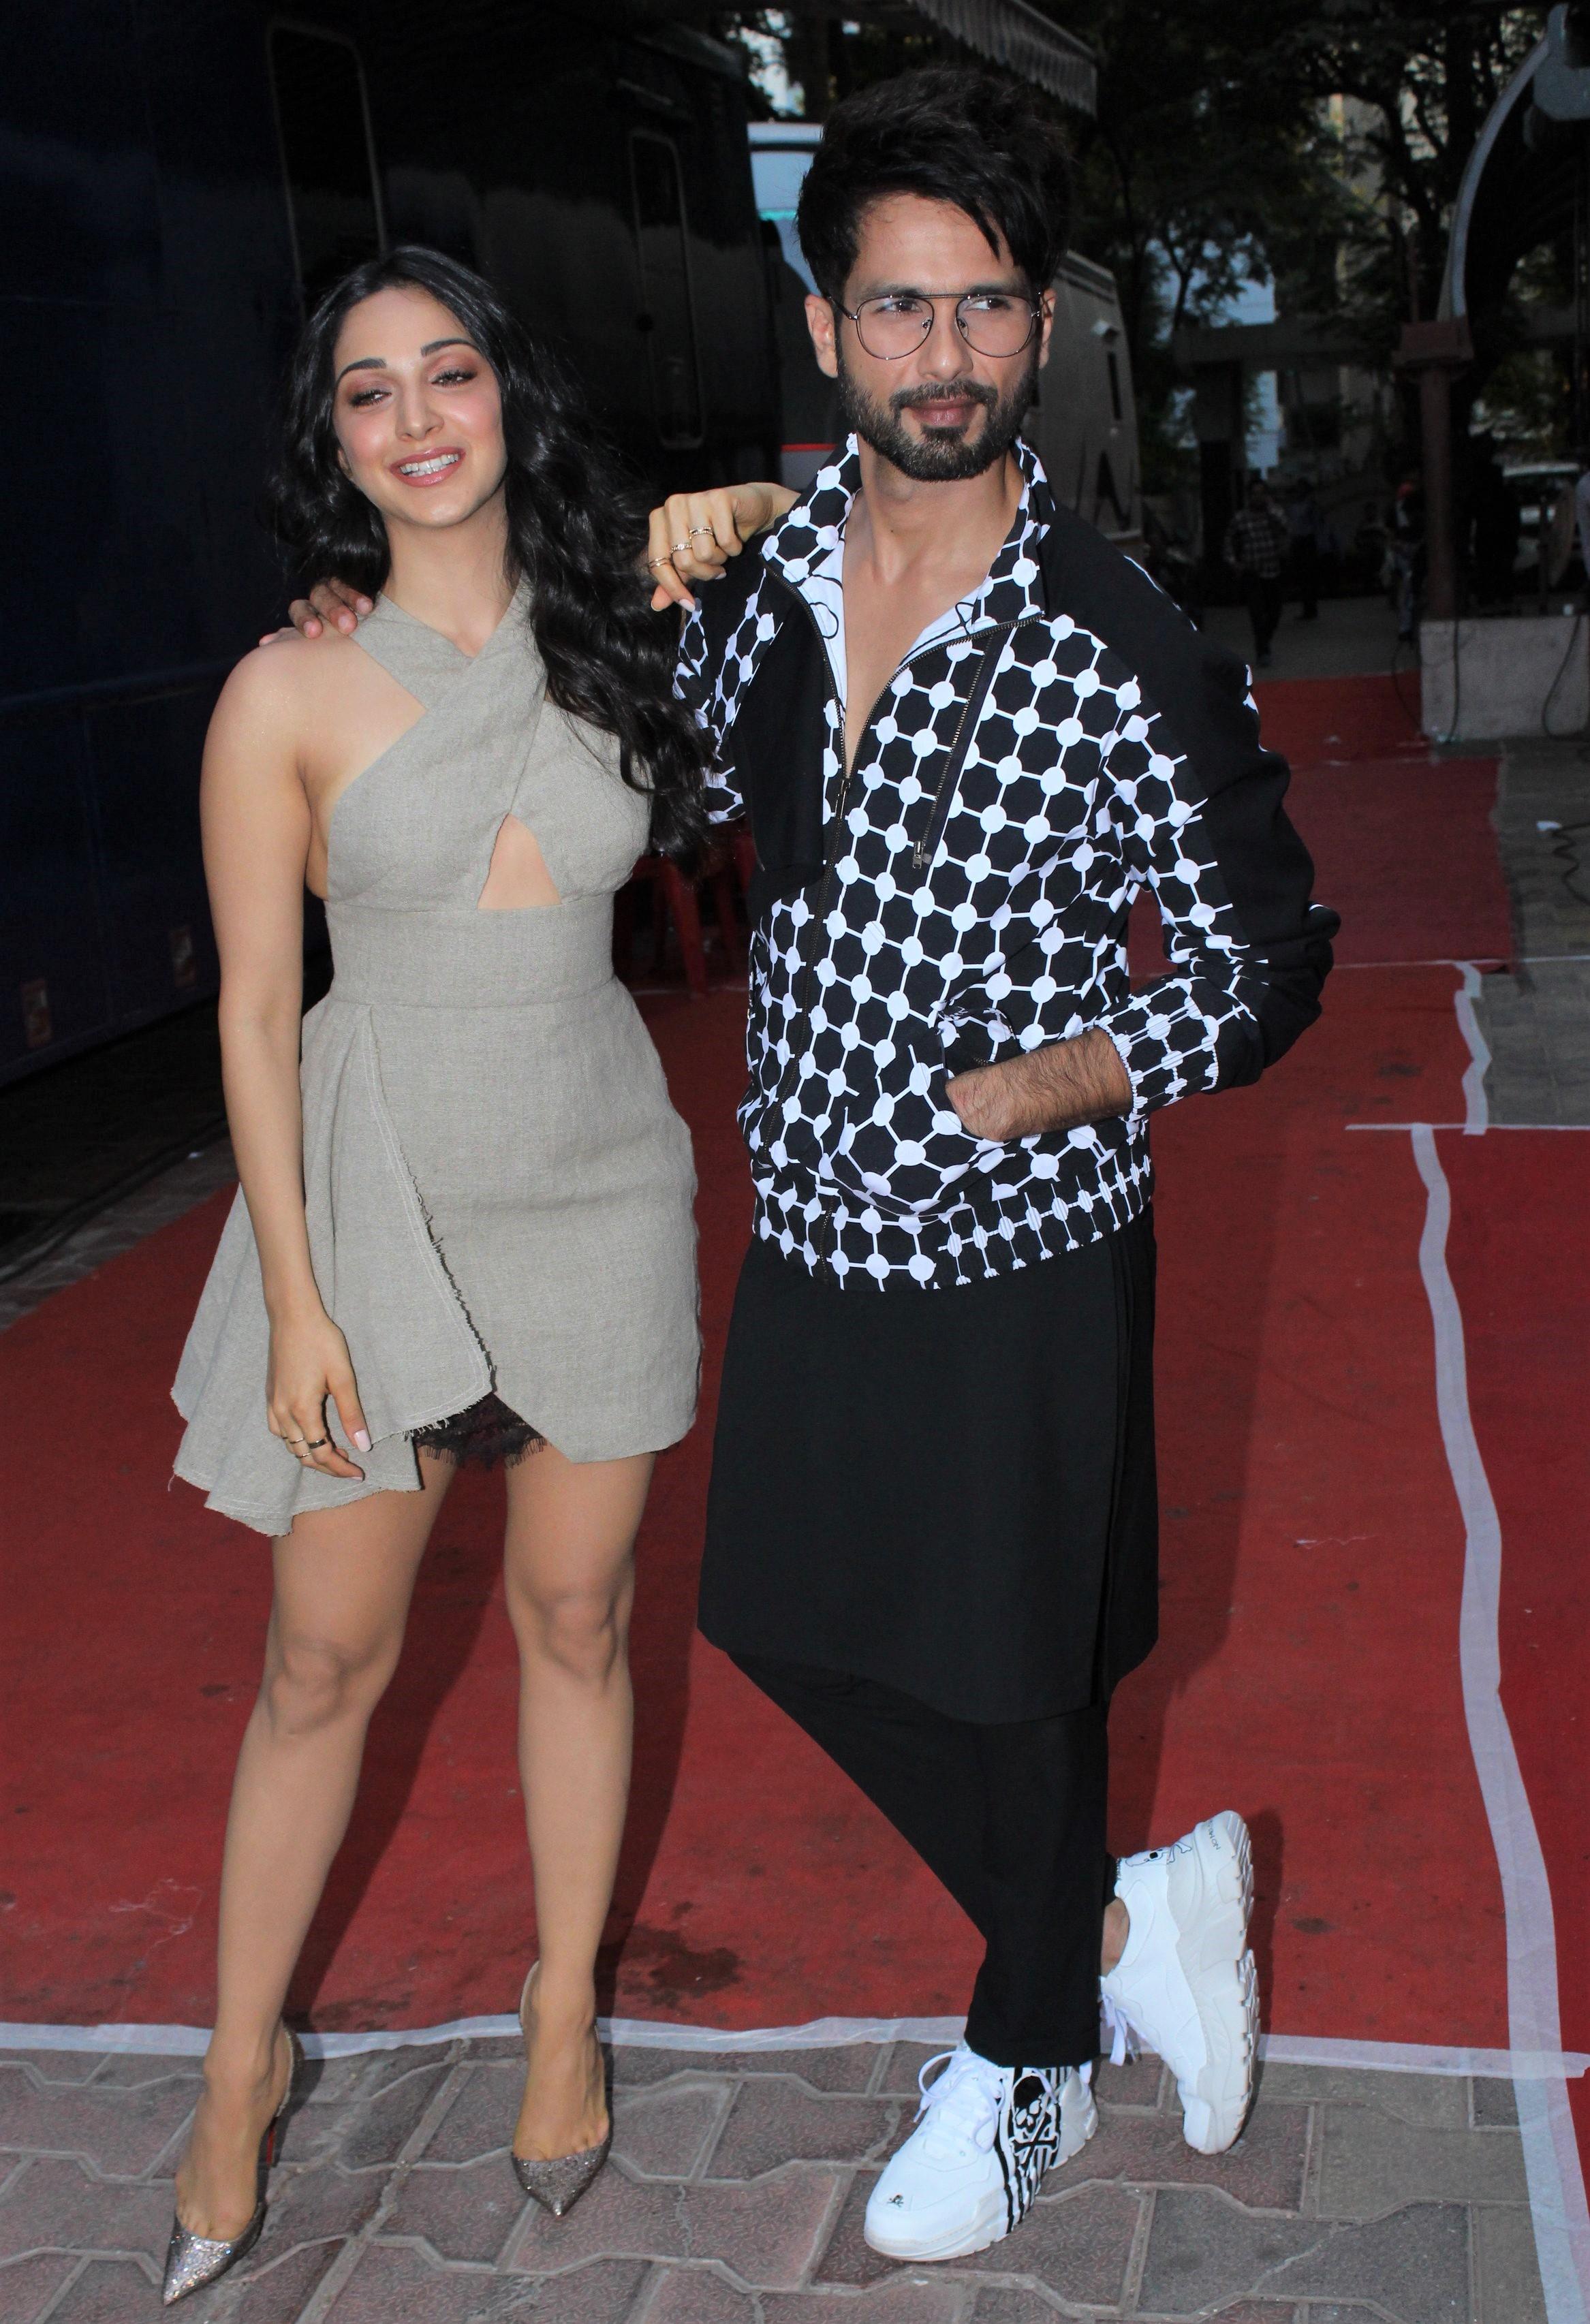 Shahid Kapoor and Kiara Advani Tease Their Kabir Singh Chemistry During Promos!